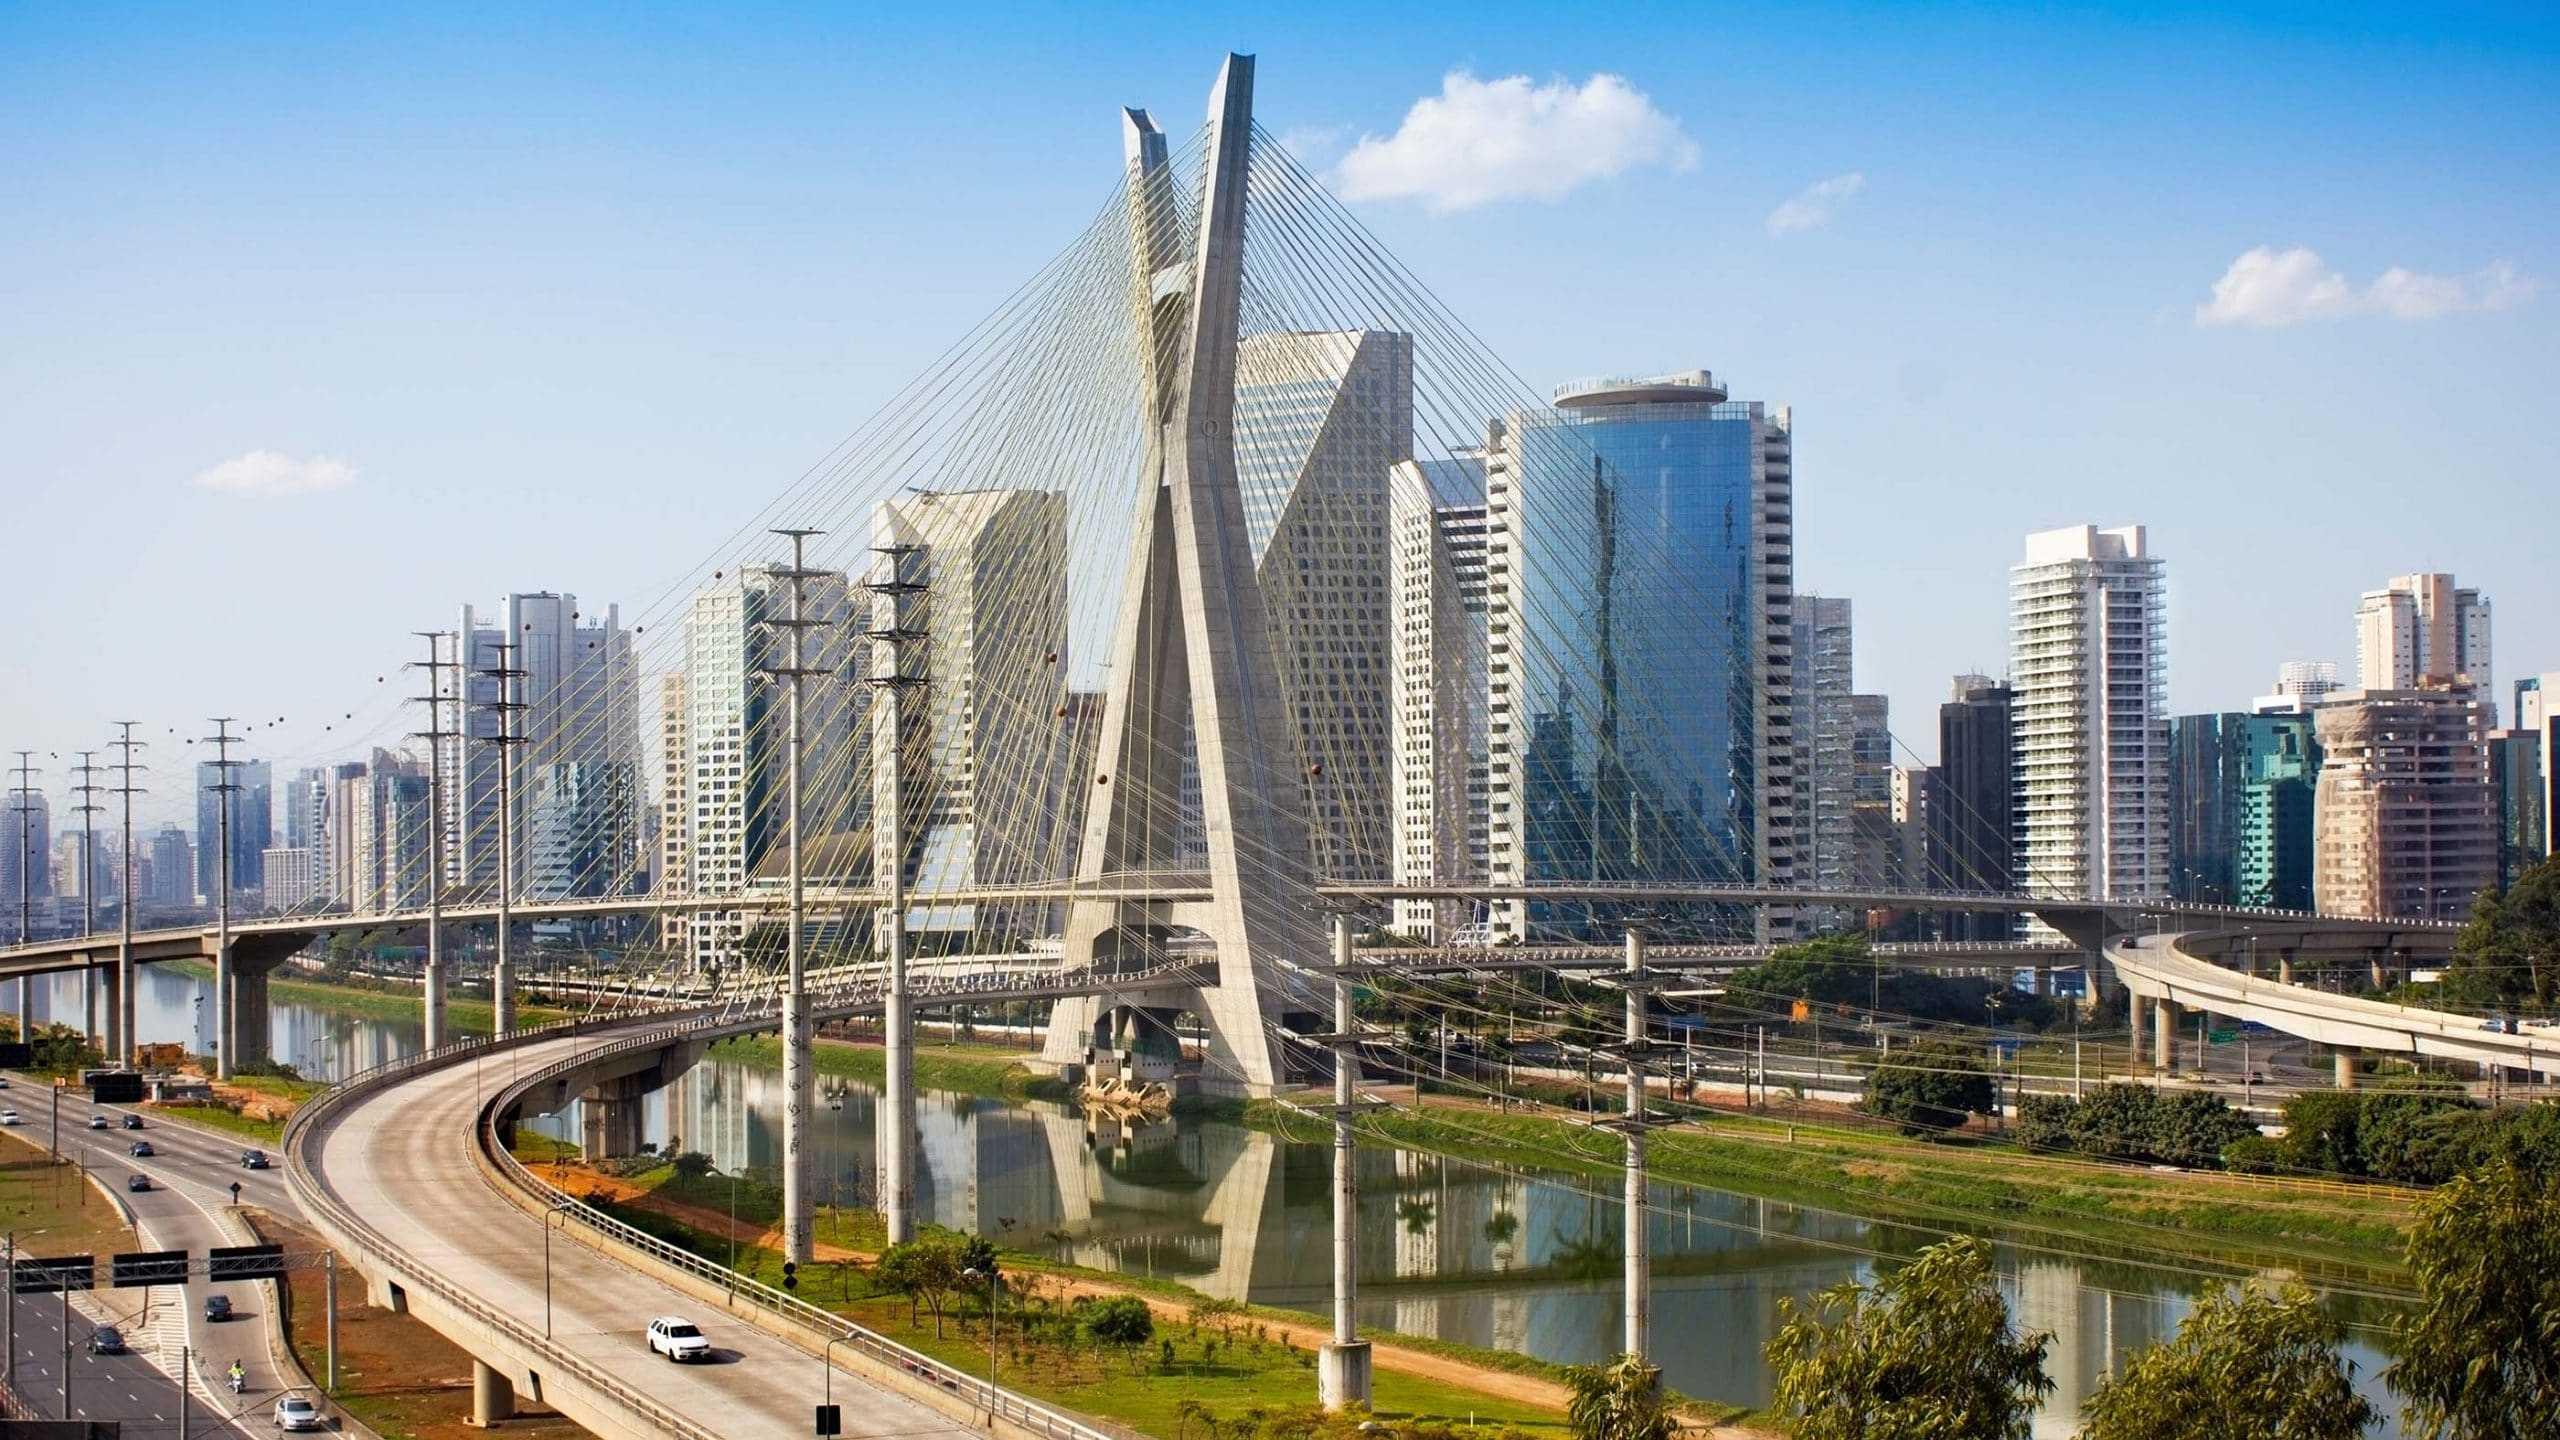 Sao Paulo-Guarulhos International Airport